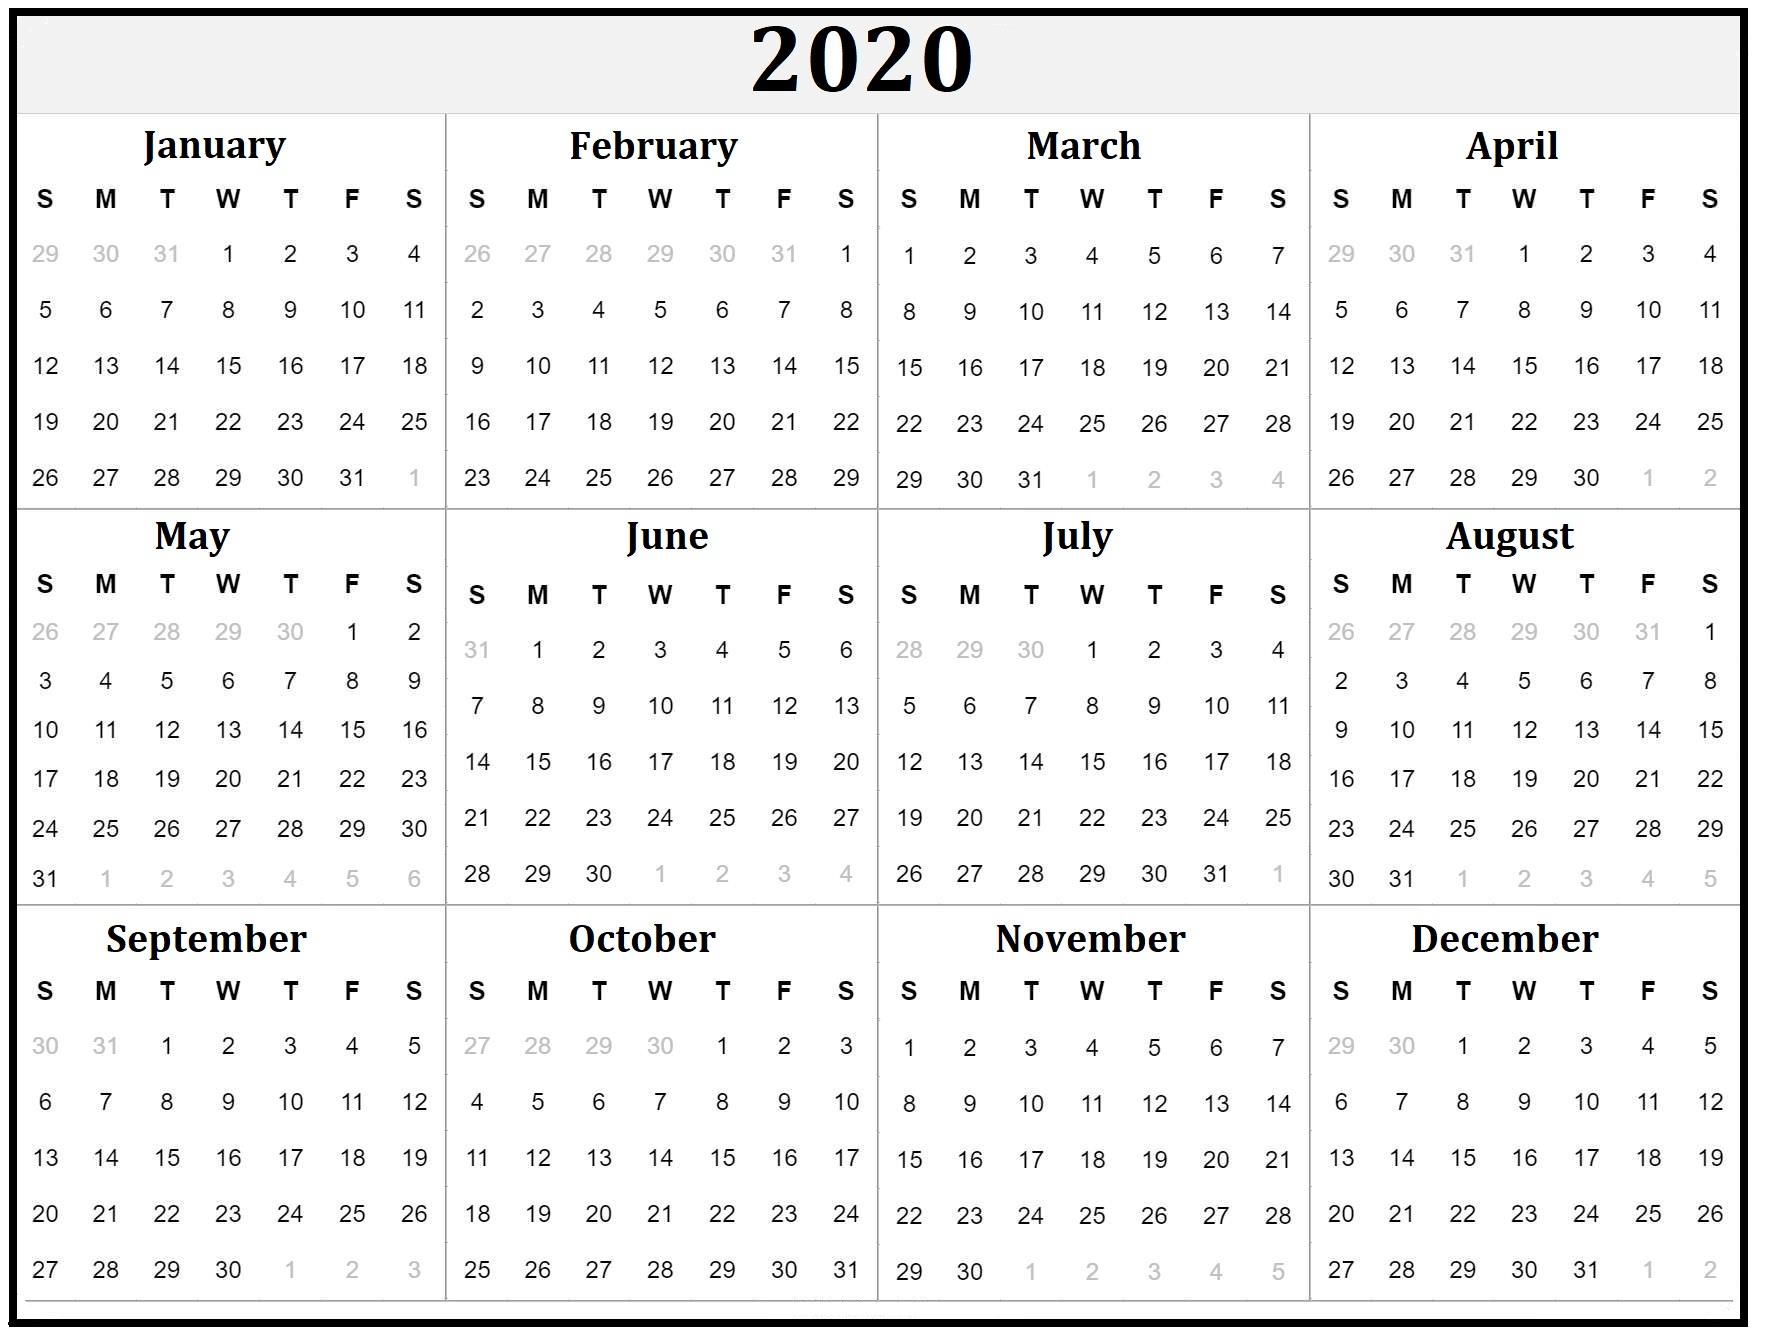 Free Printable Calendars & Holidays - Calendar-Kart regarding Yearly Printable Calendar 2020